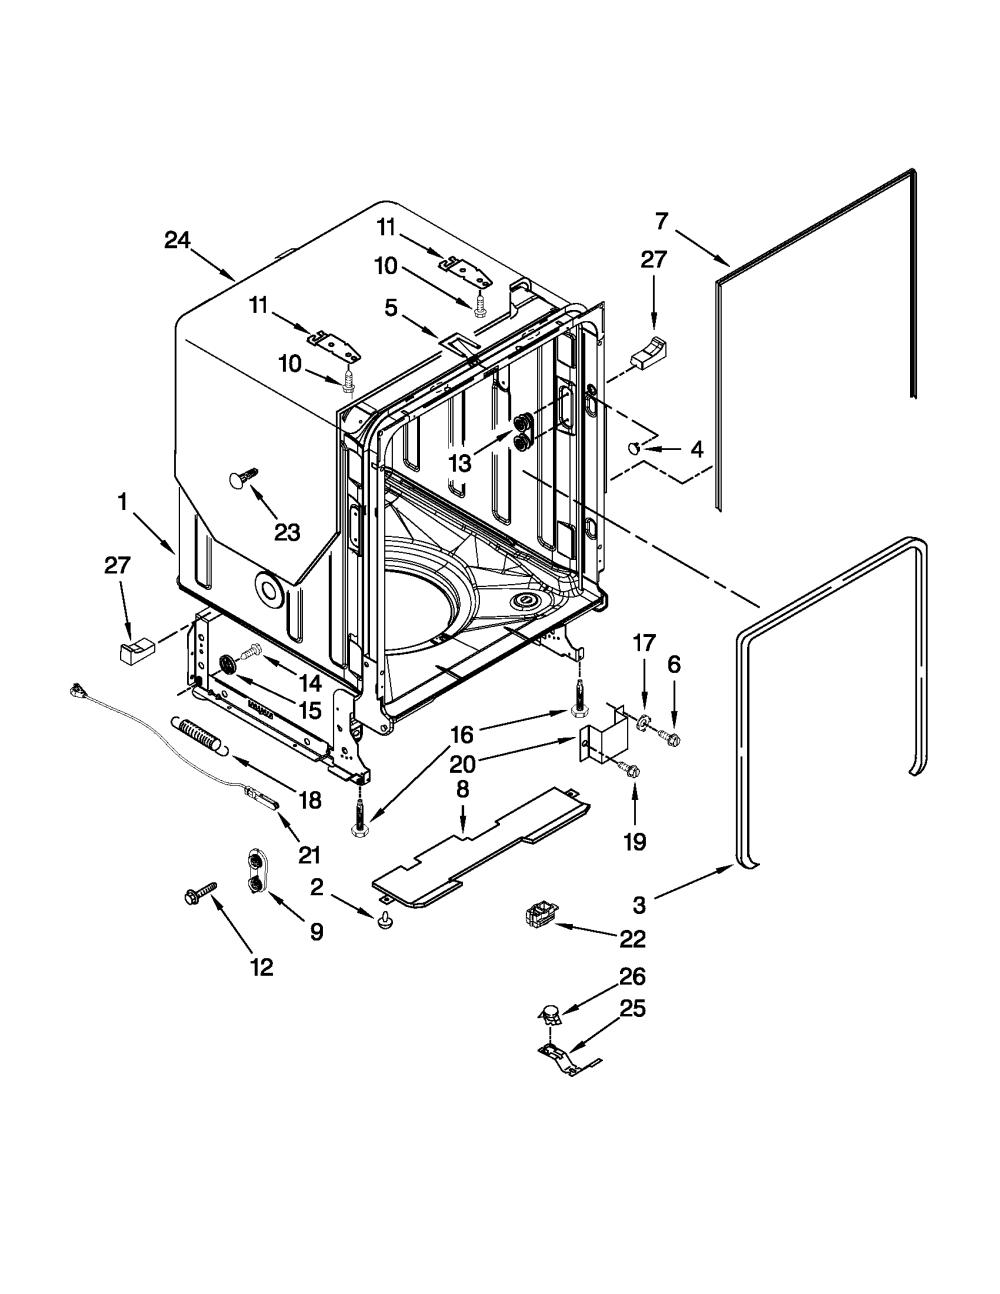 medium resolution of kitchenaid dishwasher wiring harnes diagram